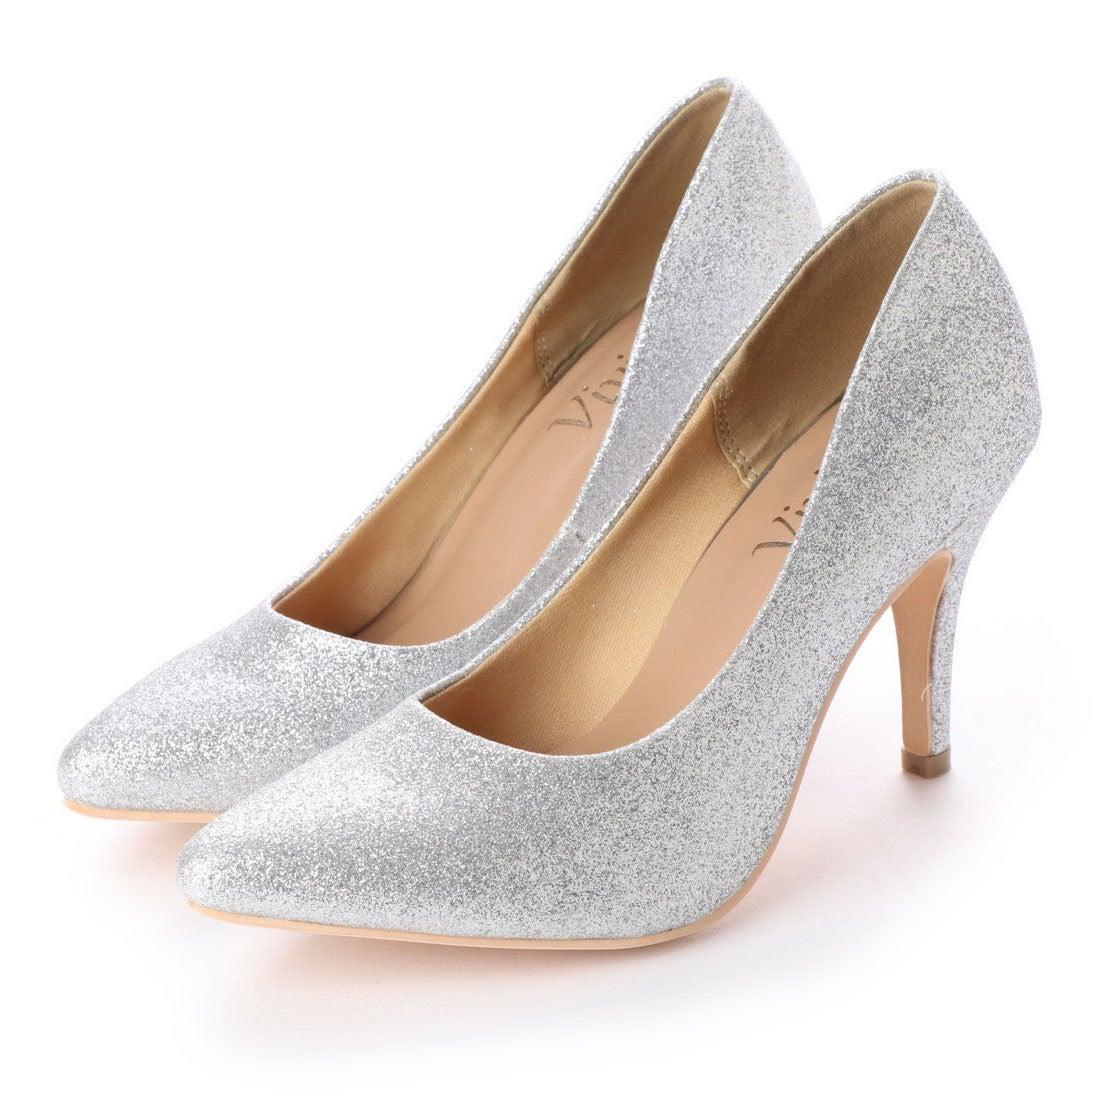 51888c2adbd9ca ヴィヴィアン Vivian ポインテッドトゥ9cmキレイめパンプス (シルバーグリッター) -靴&ファッション通販 ロコンド〜自宅で試着、気軽に返品